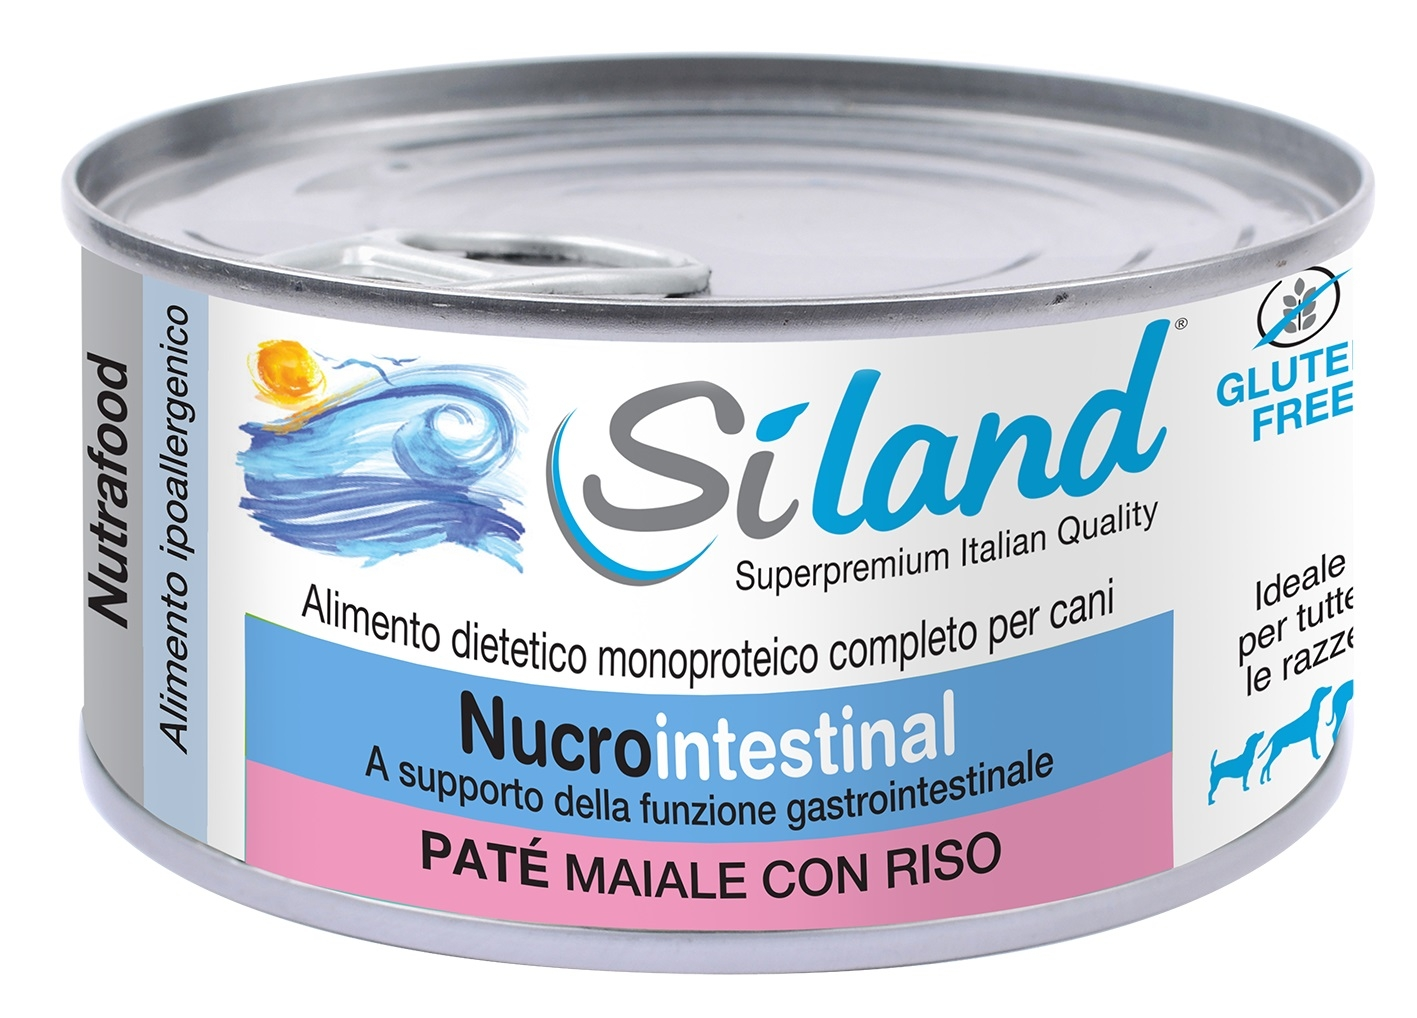 SILAND nucrointestinal PATE MAIALE CON RISO Alime